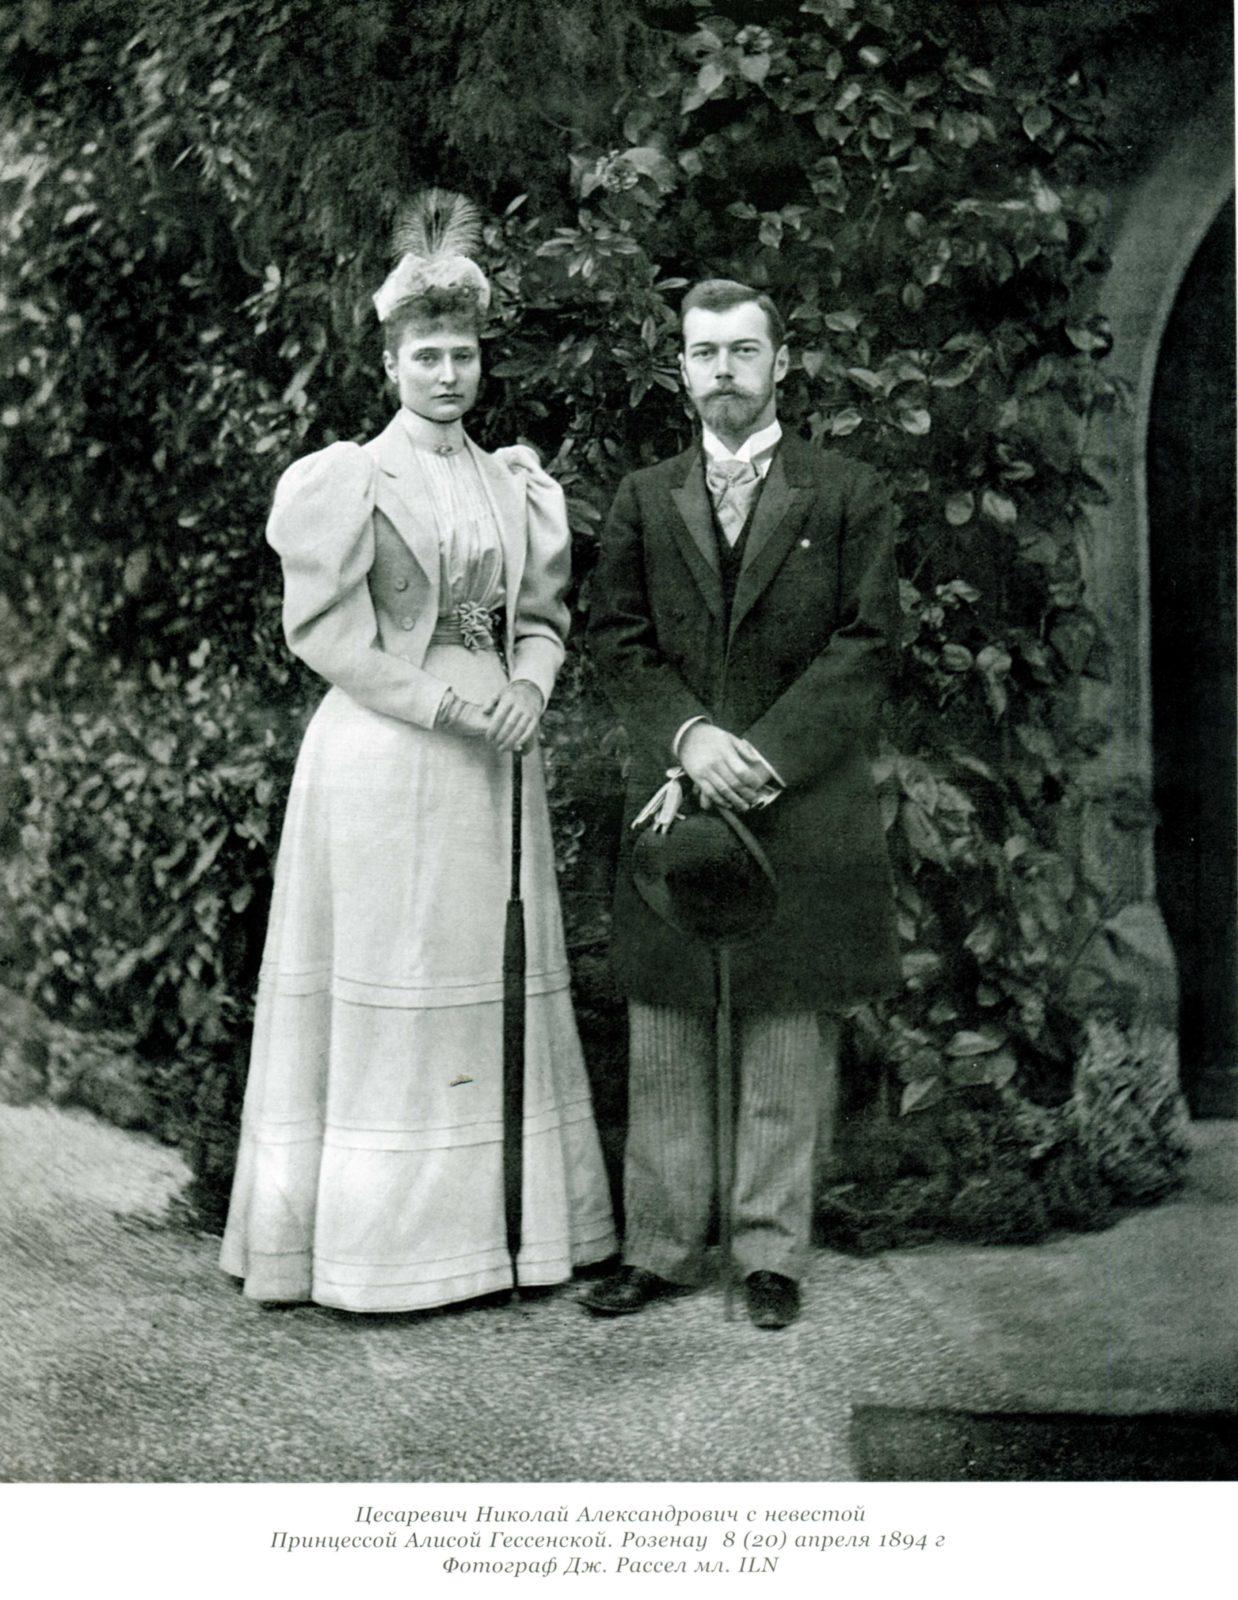 Tsarevich Nikolai Alexandrovich with his bride Hessian Princess Alice.